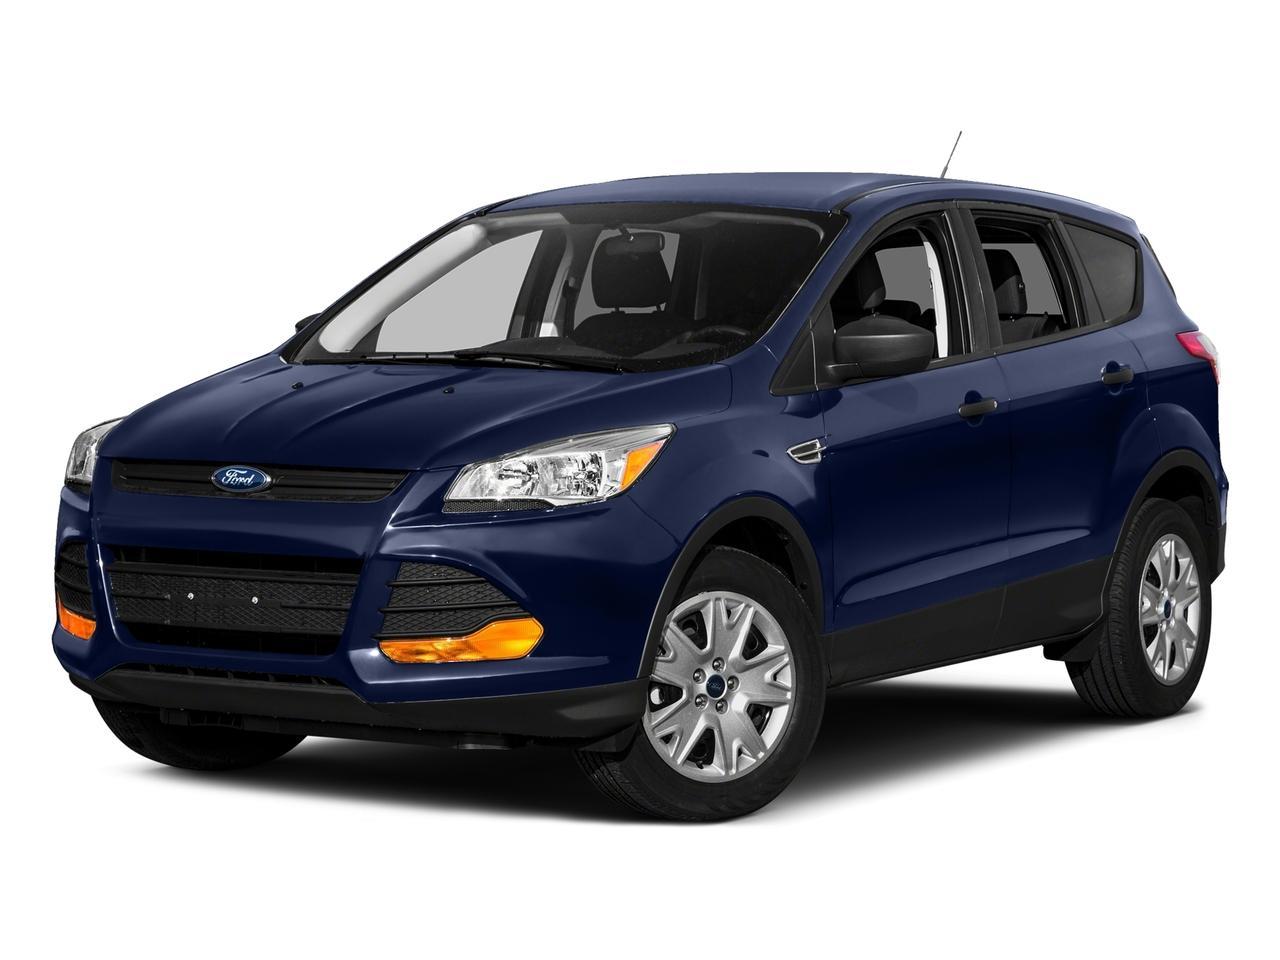 2016 Ford Escape Vehicle Photo in San Antonio, TX 78238